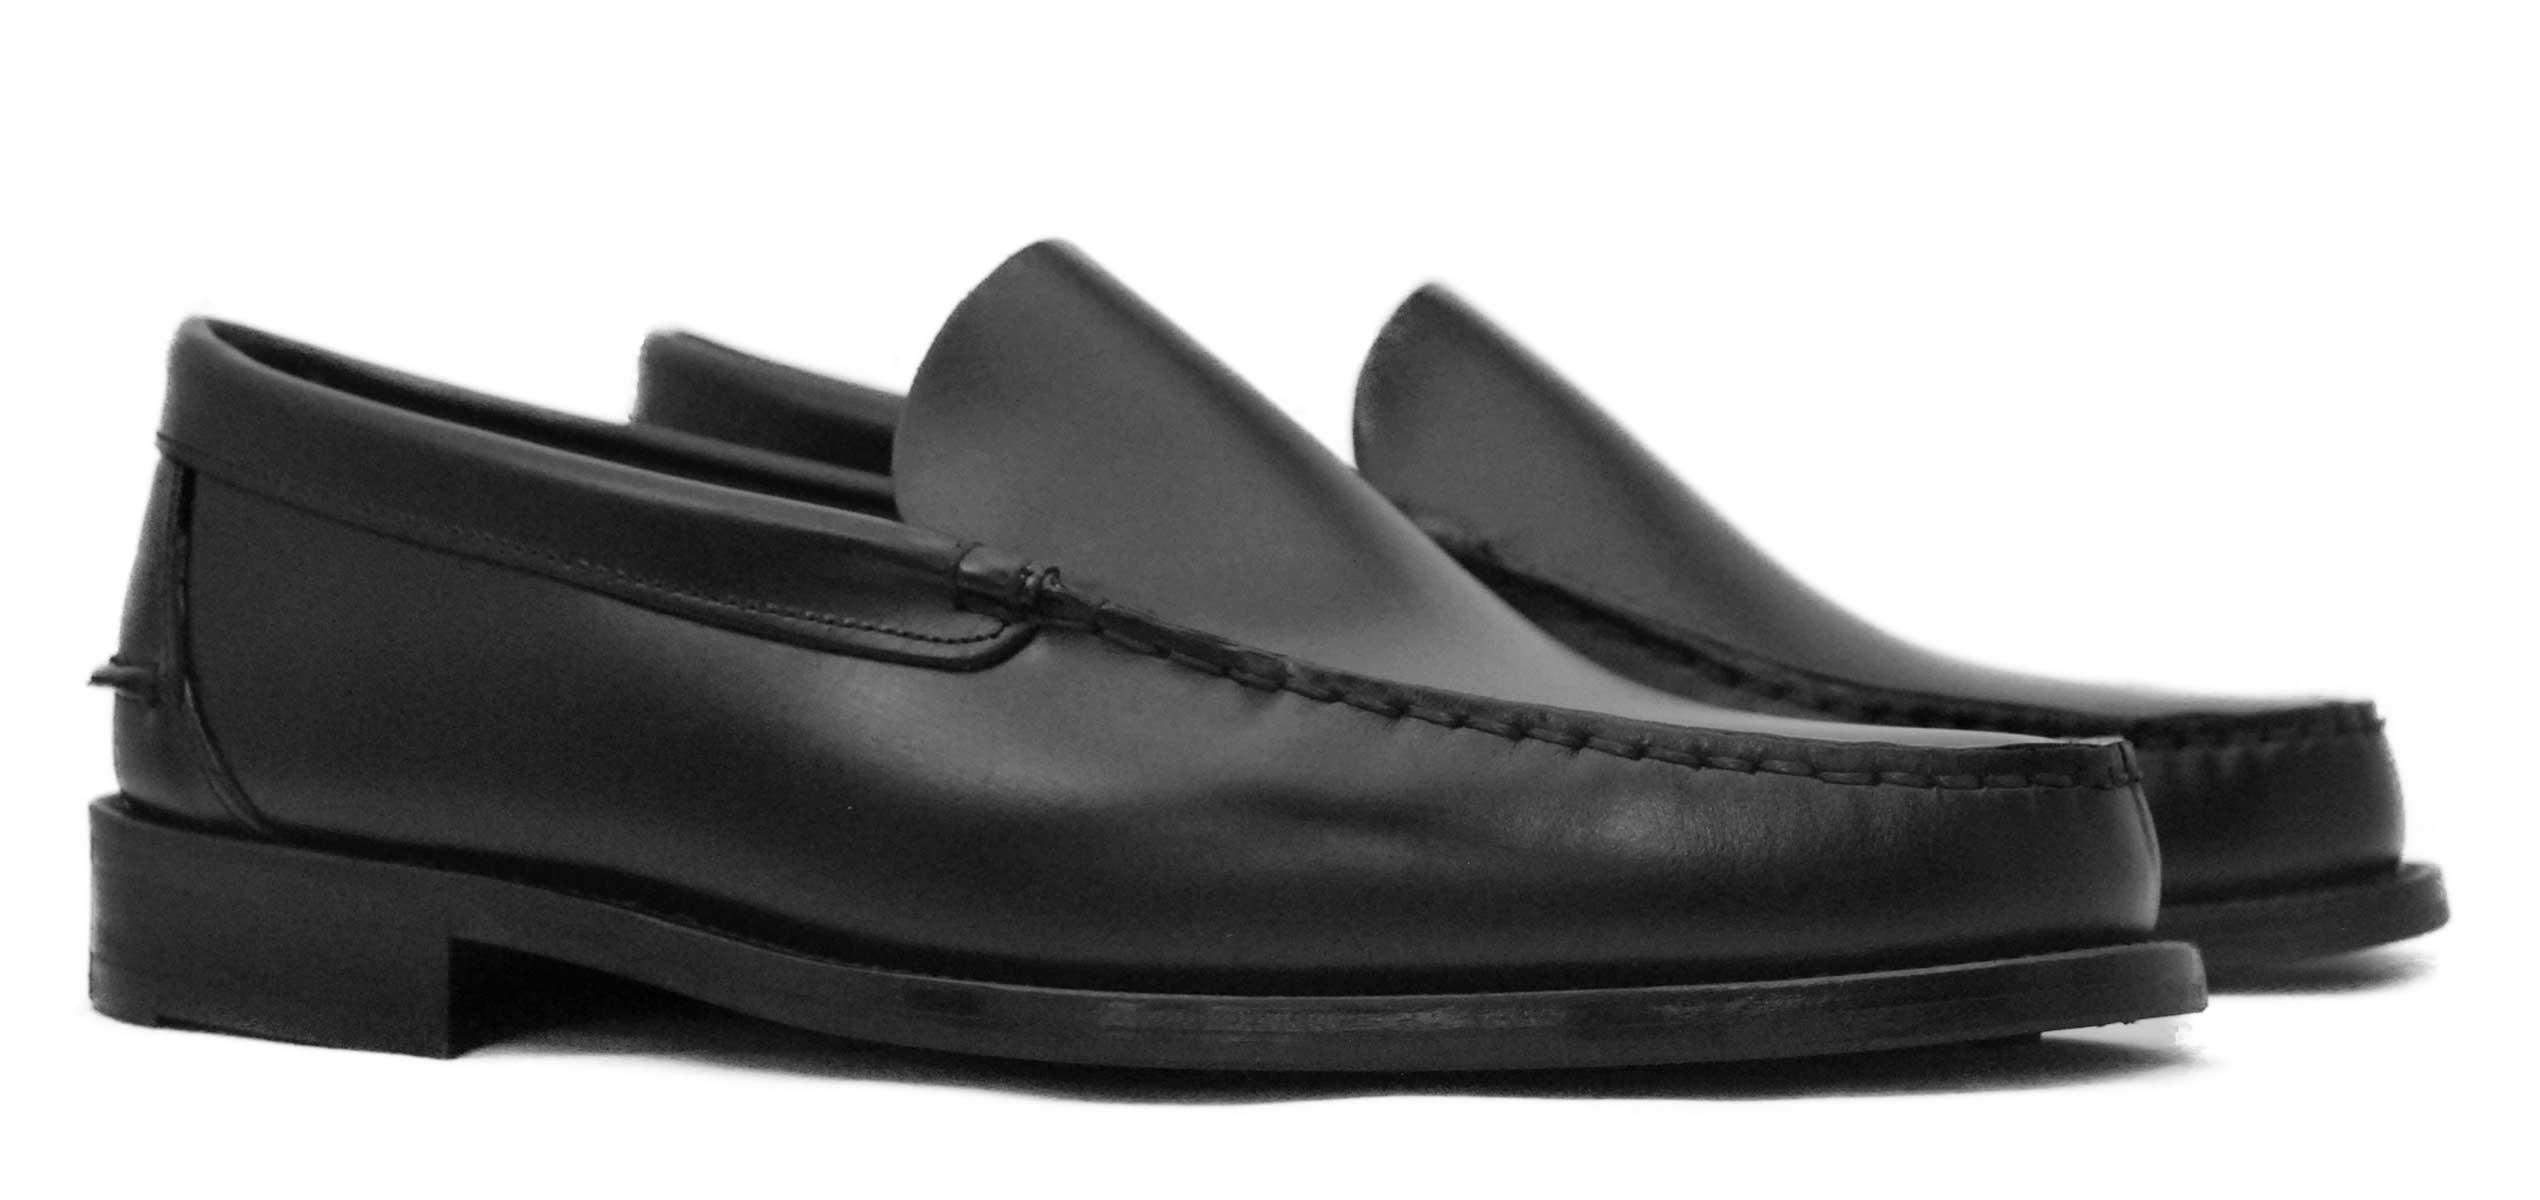 Foto 5 de Zapato Castellano 102 Liso Negro Botones